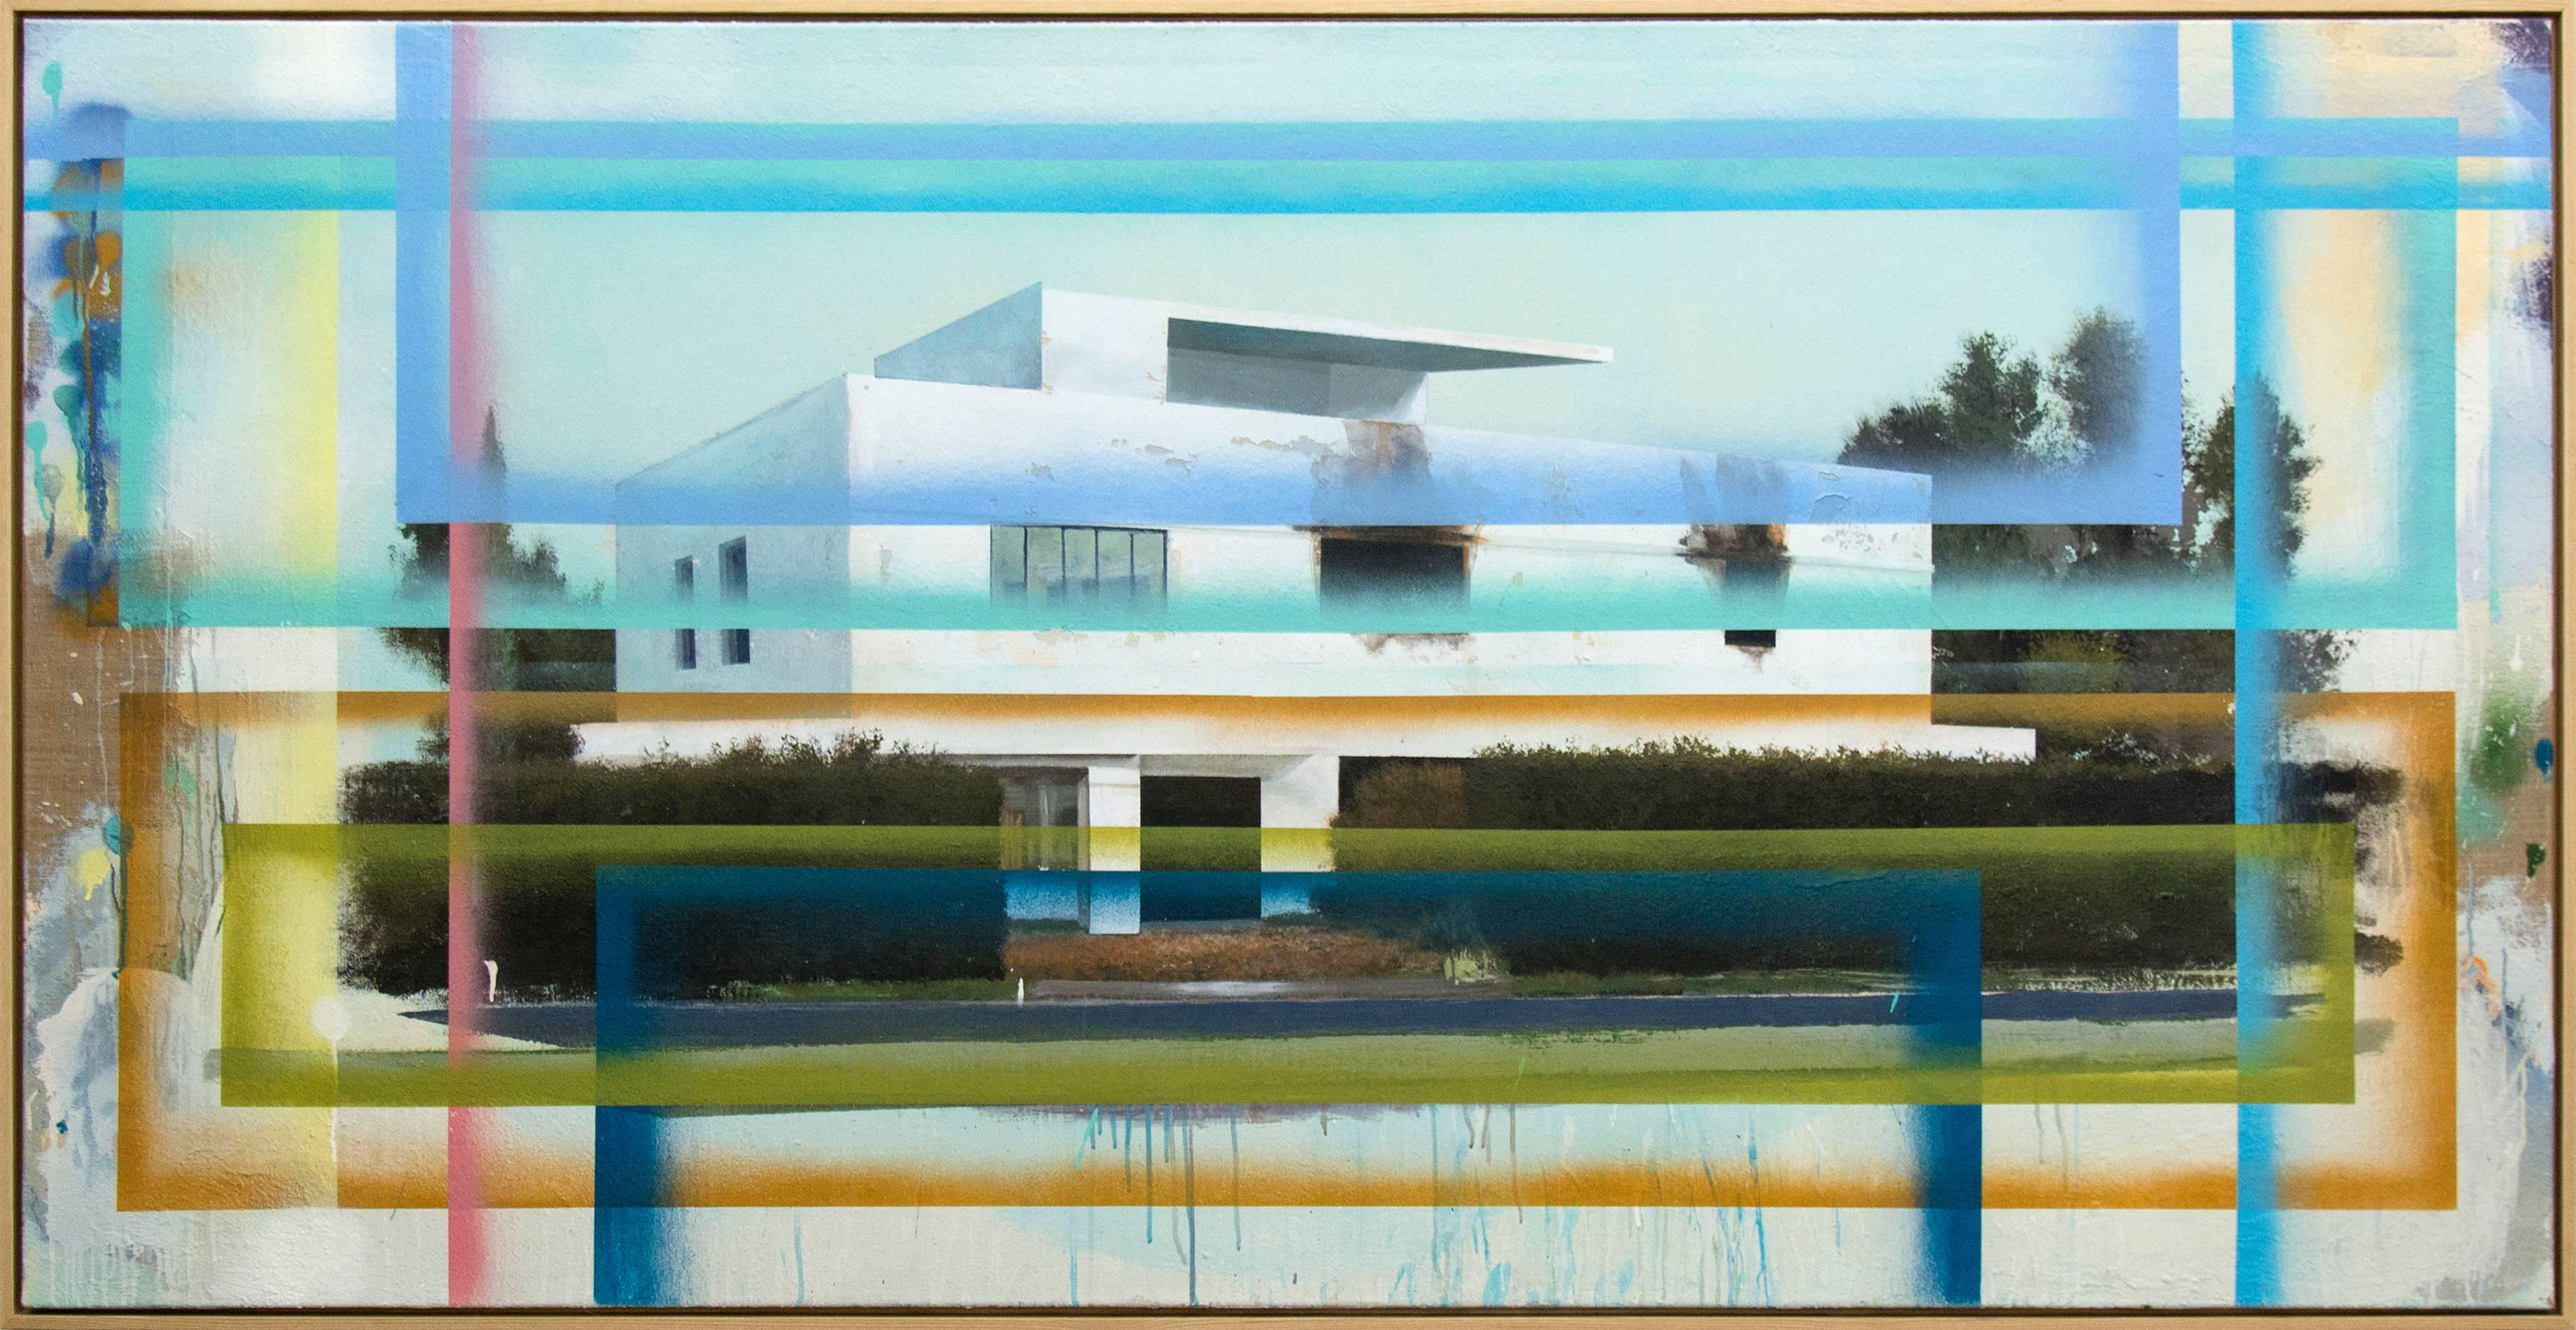 Bauhaus No 02 - large, blue, green, architecture, deconstruction, mixed media